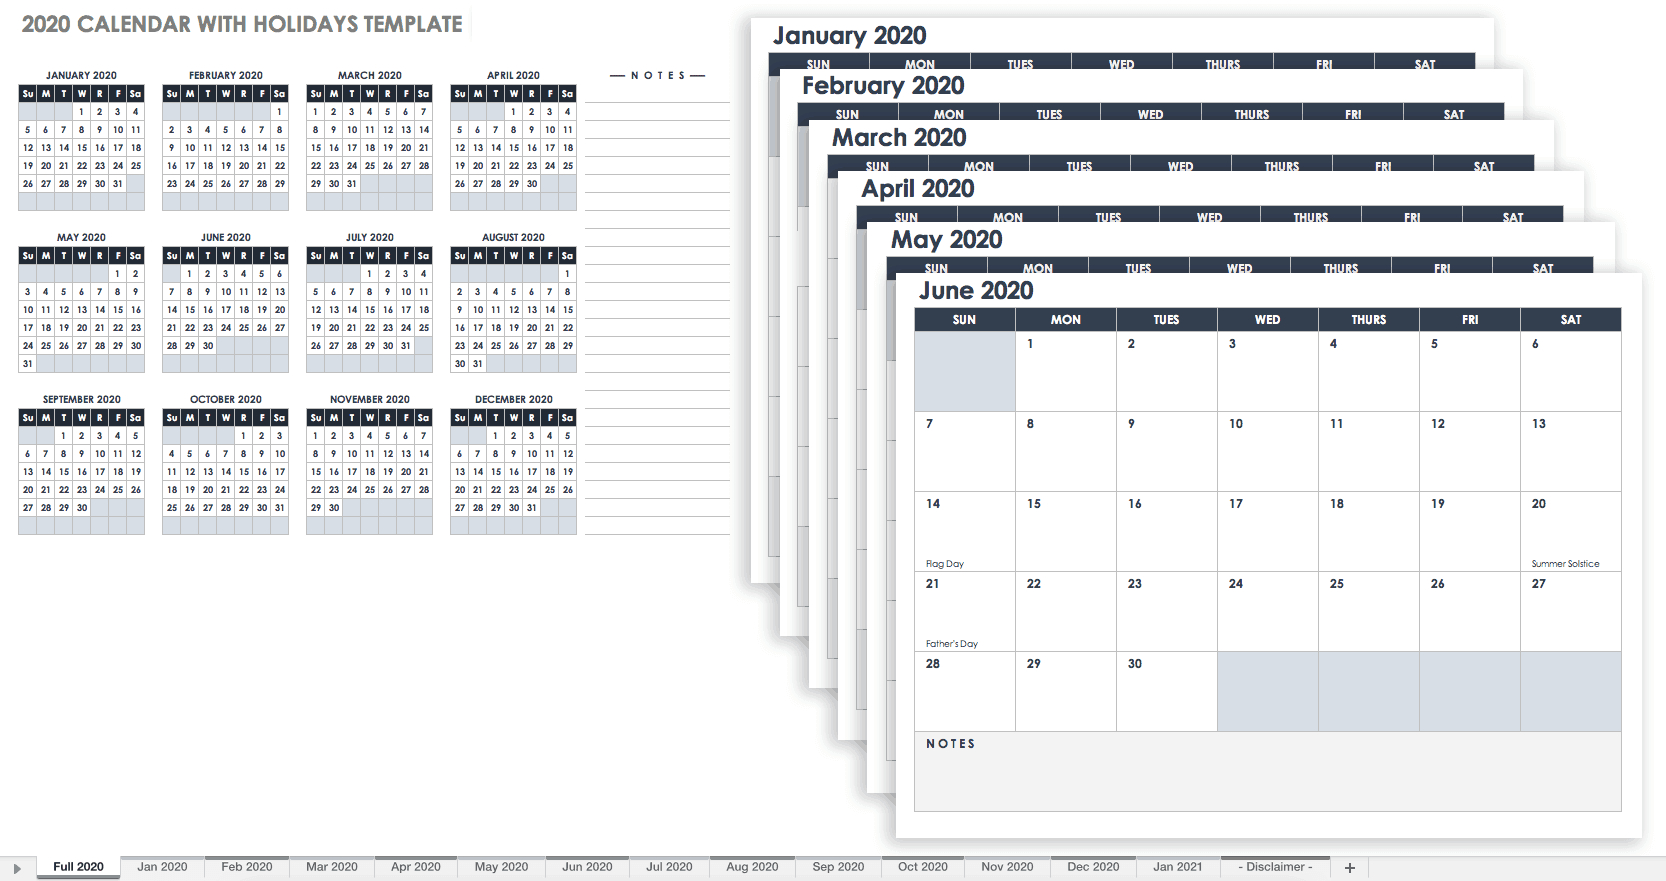 Free Google Calendar Templates | Smartsheet inside Google Calendar Template 2020